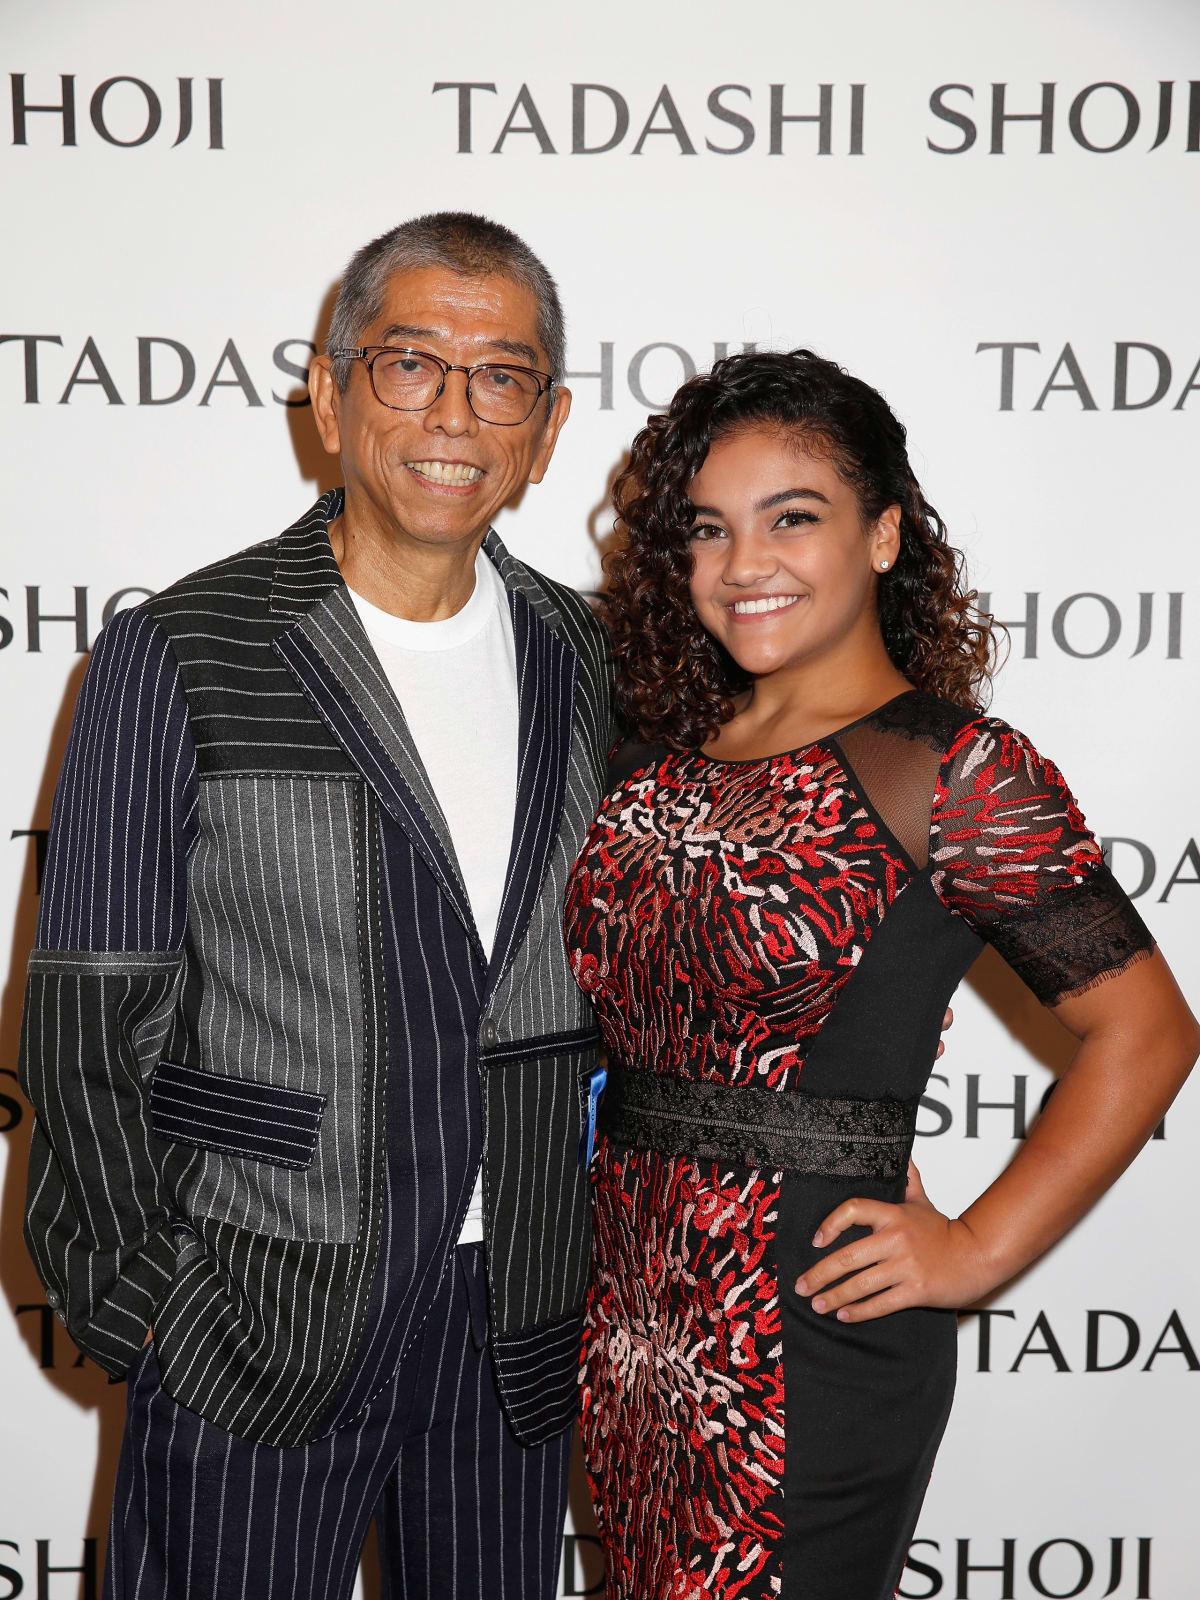 Tadashi Shoji and Laurie Hernandez